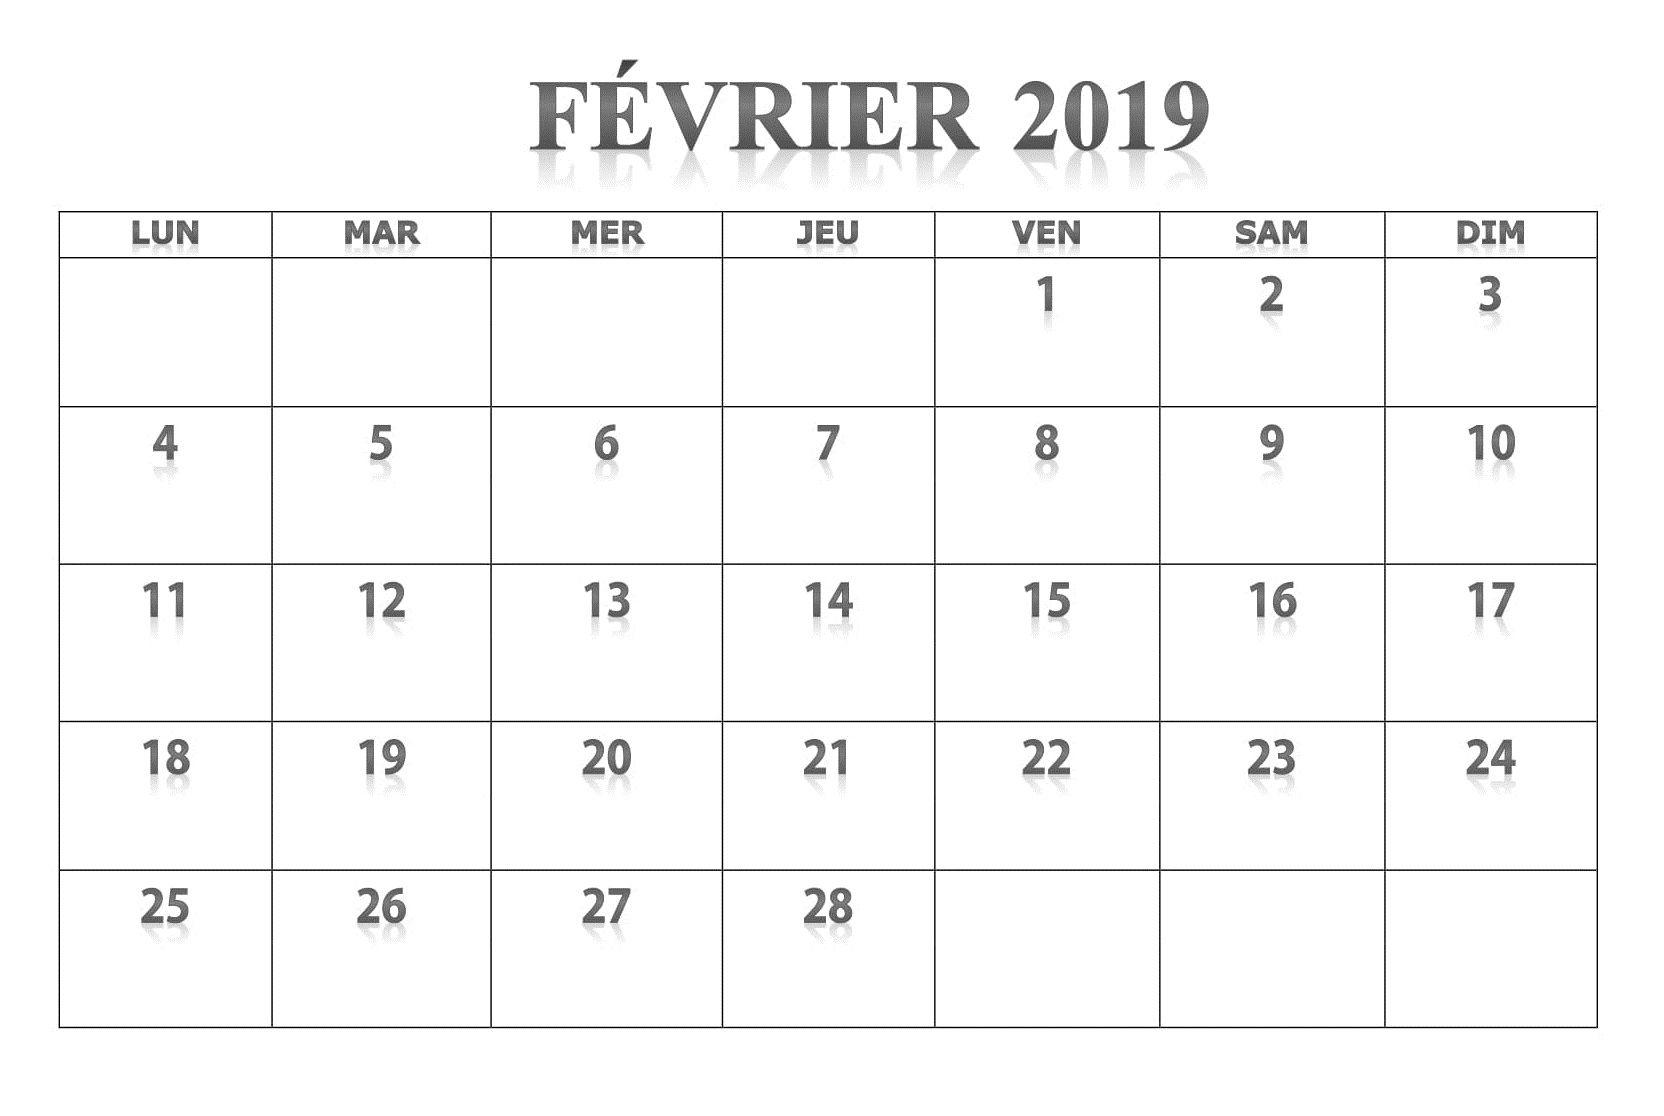 Page Calendrier.Fevrier Calendrier 2019 Fevrier Calendrier 2019